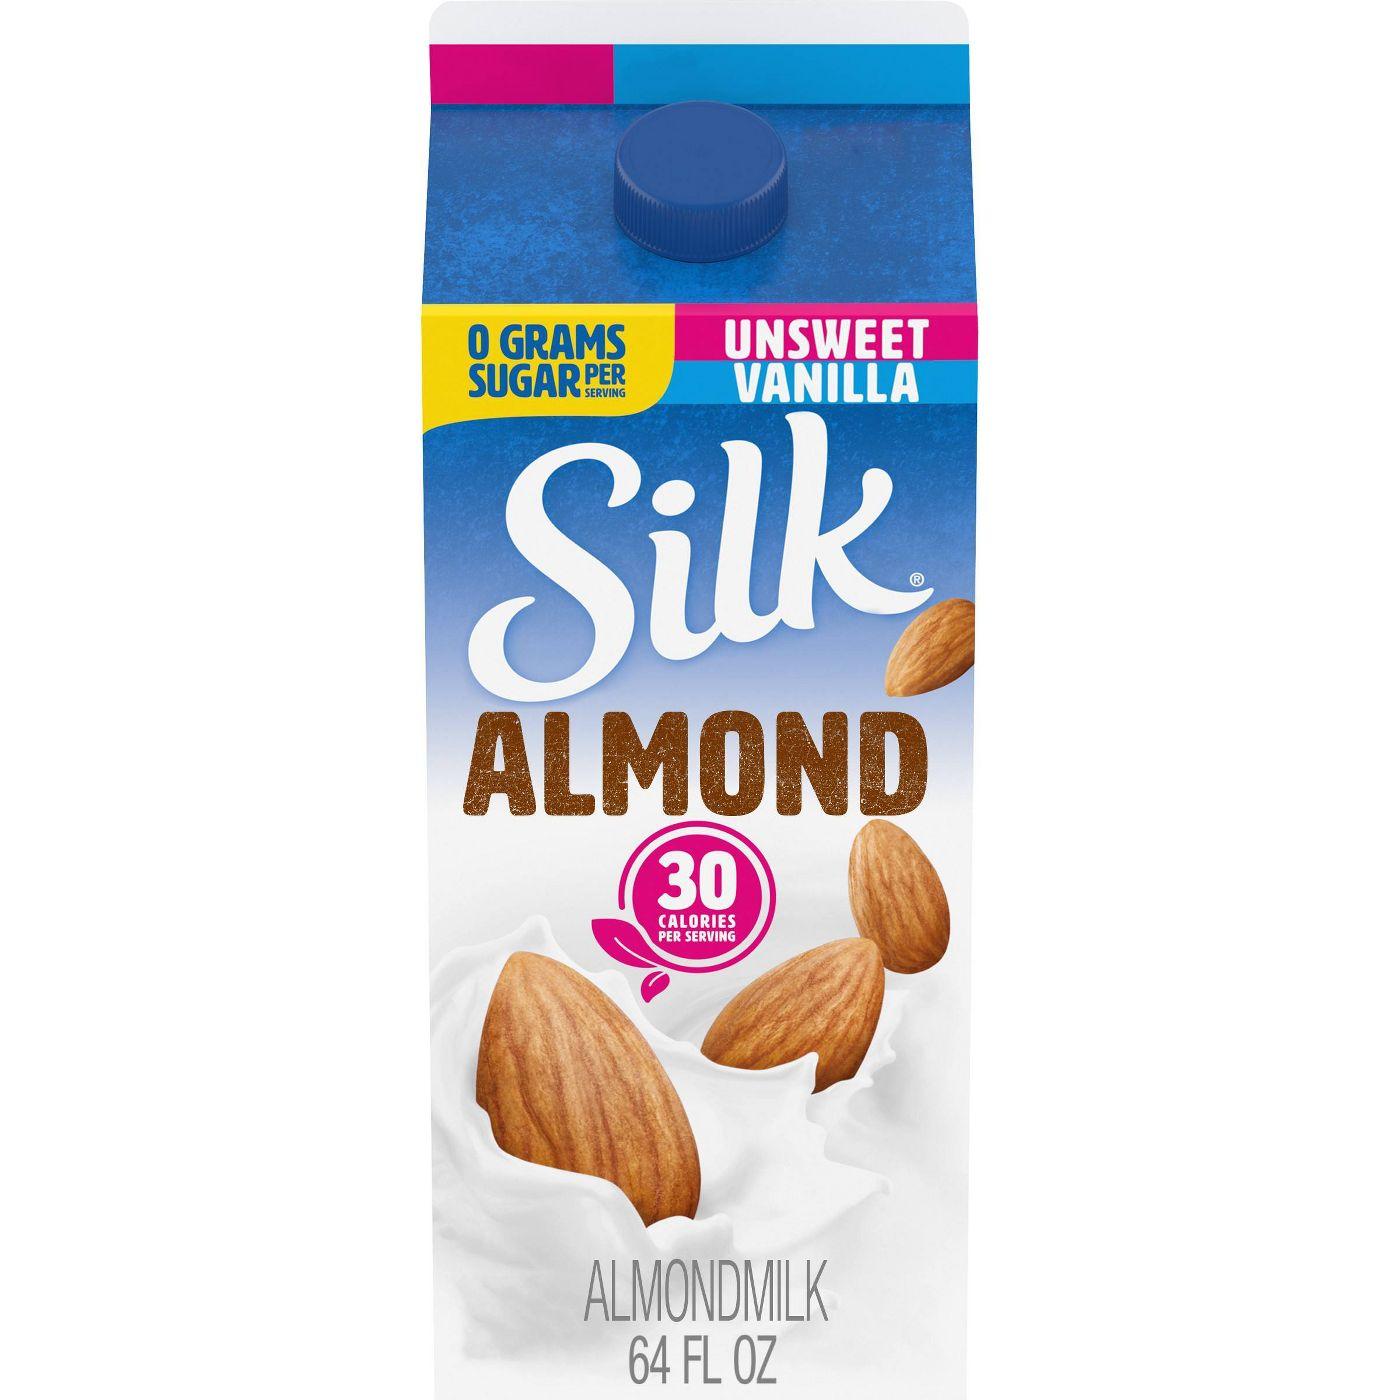 Silk Almond Unsweetened Vanilla Almond Milk - 0.5gal - image 1 of 7